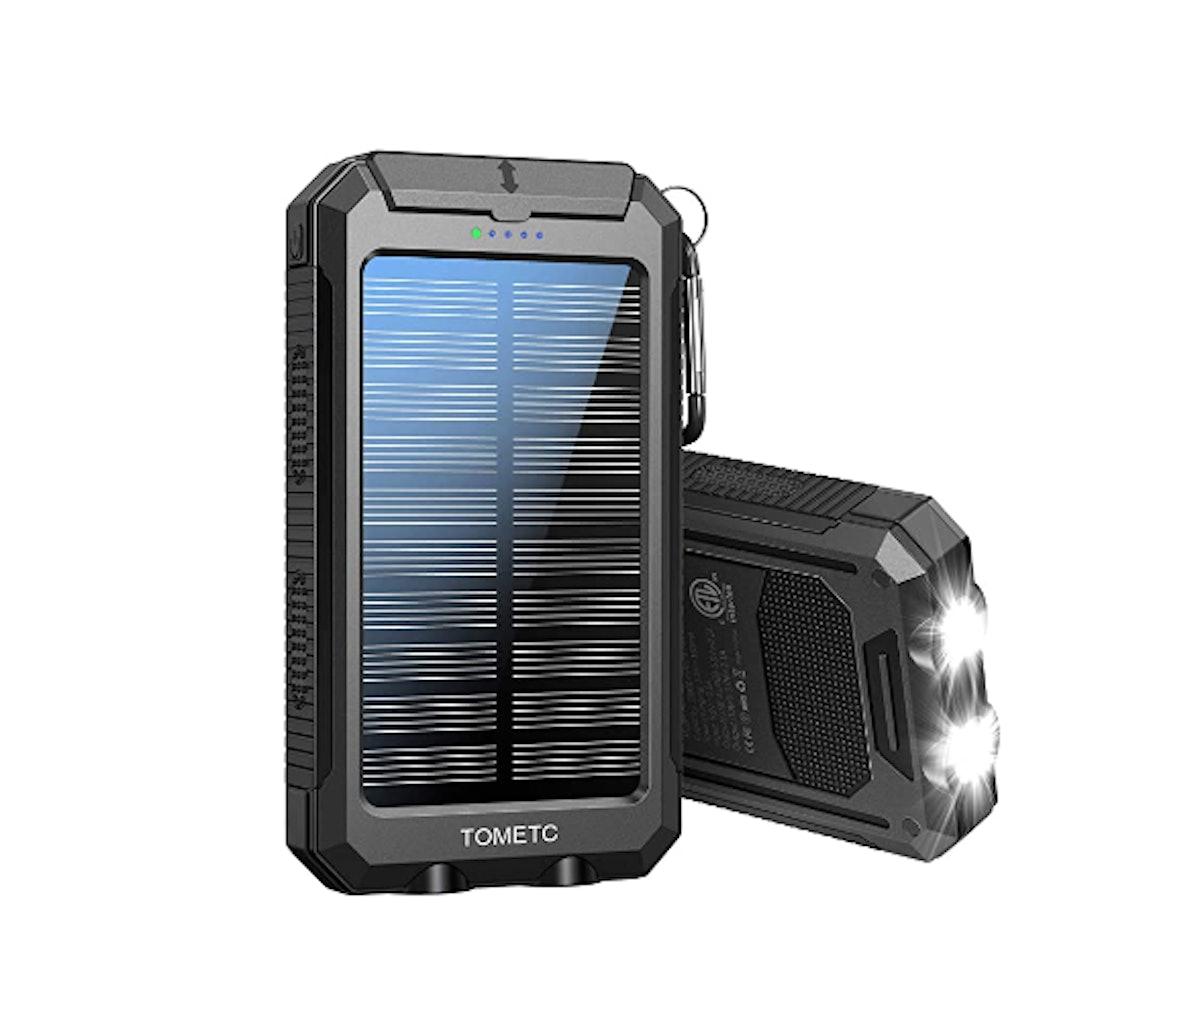 TOMETC Solar Power Bank